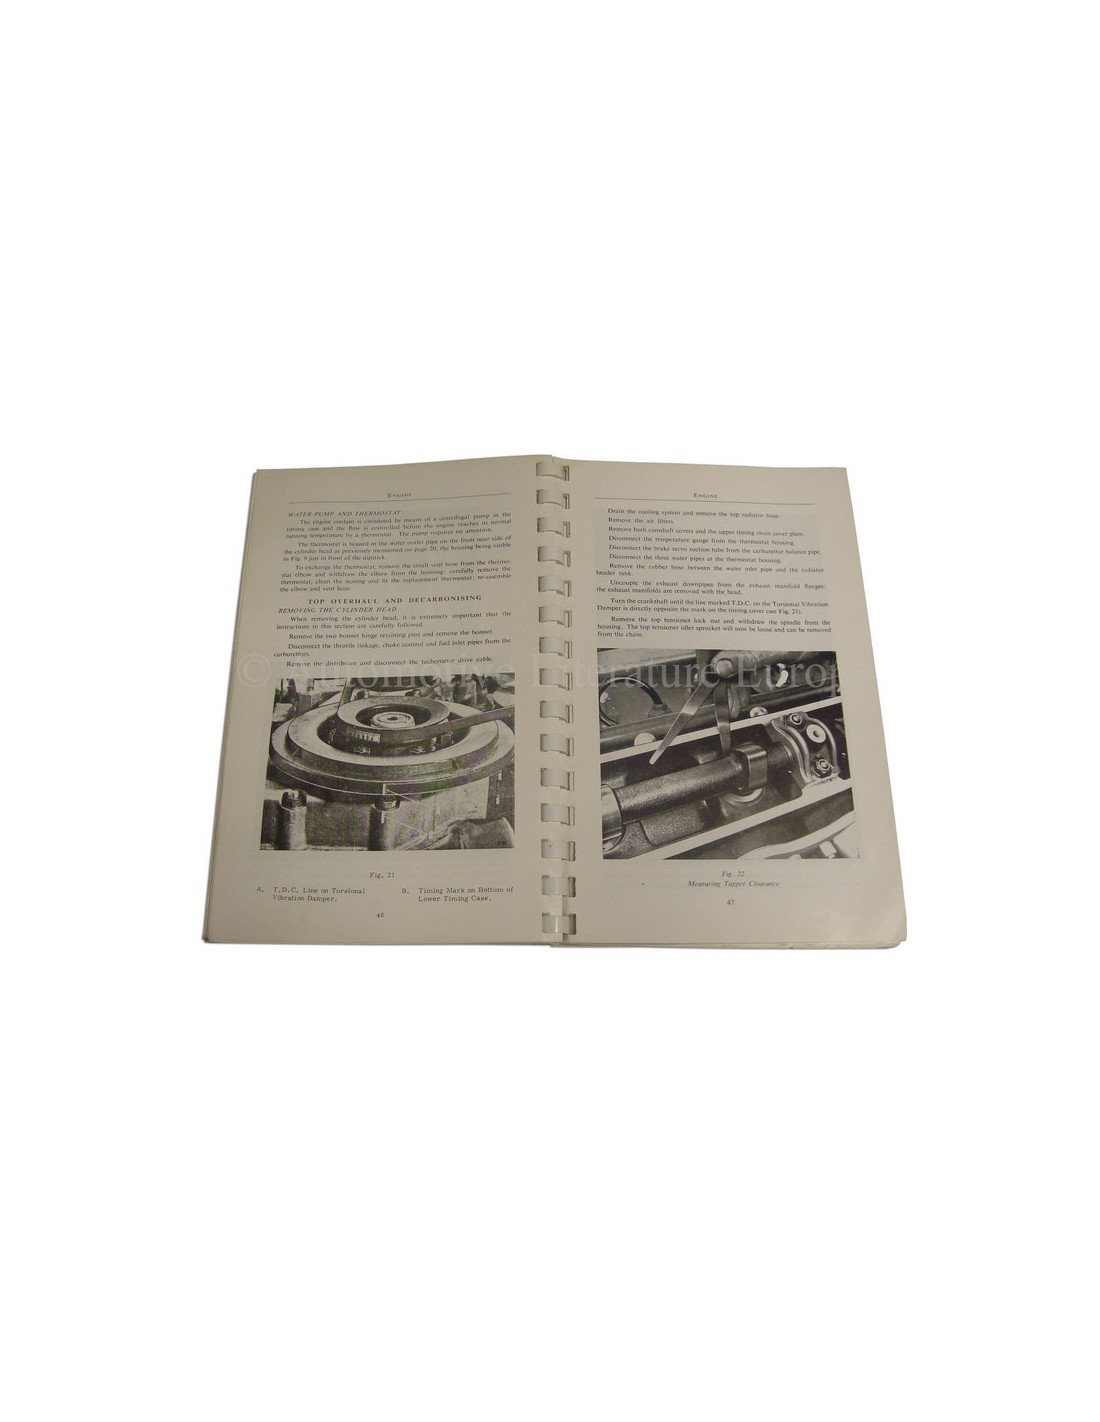 1963 aston martin db4 db4 g t owner s manual english rh autolit eu aston martin v12 vantage owners manual aston martin service manual pdf